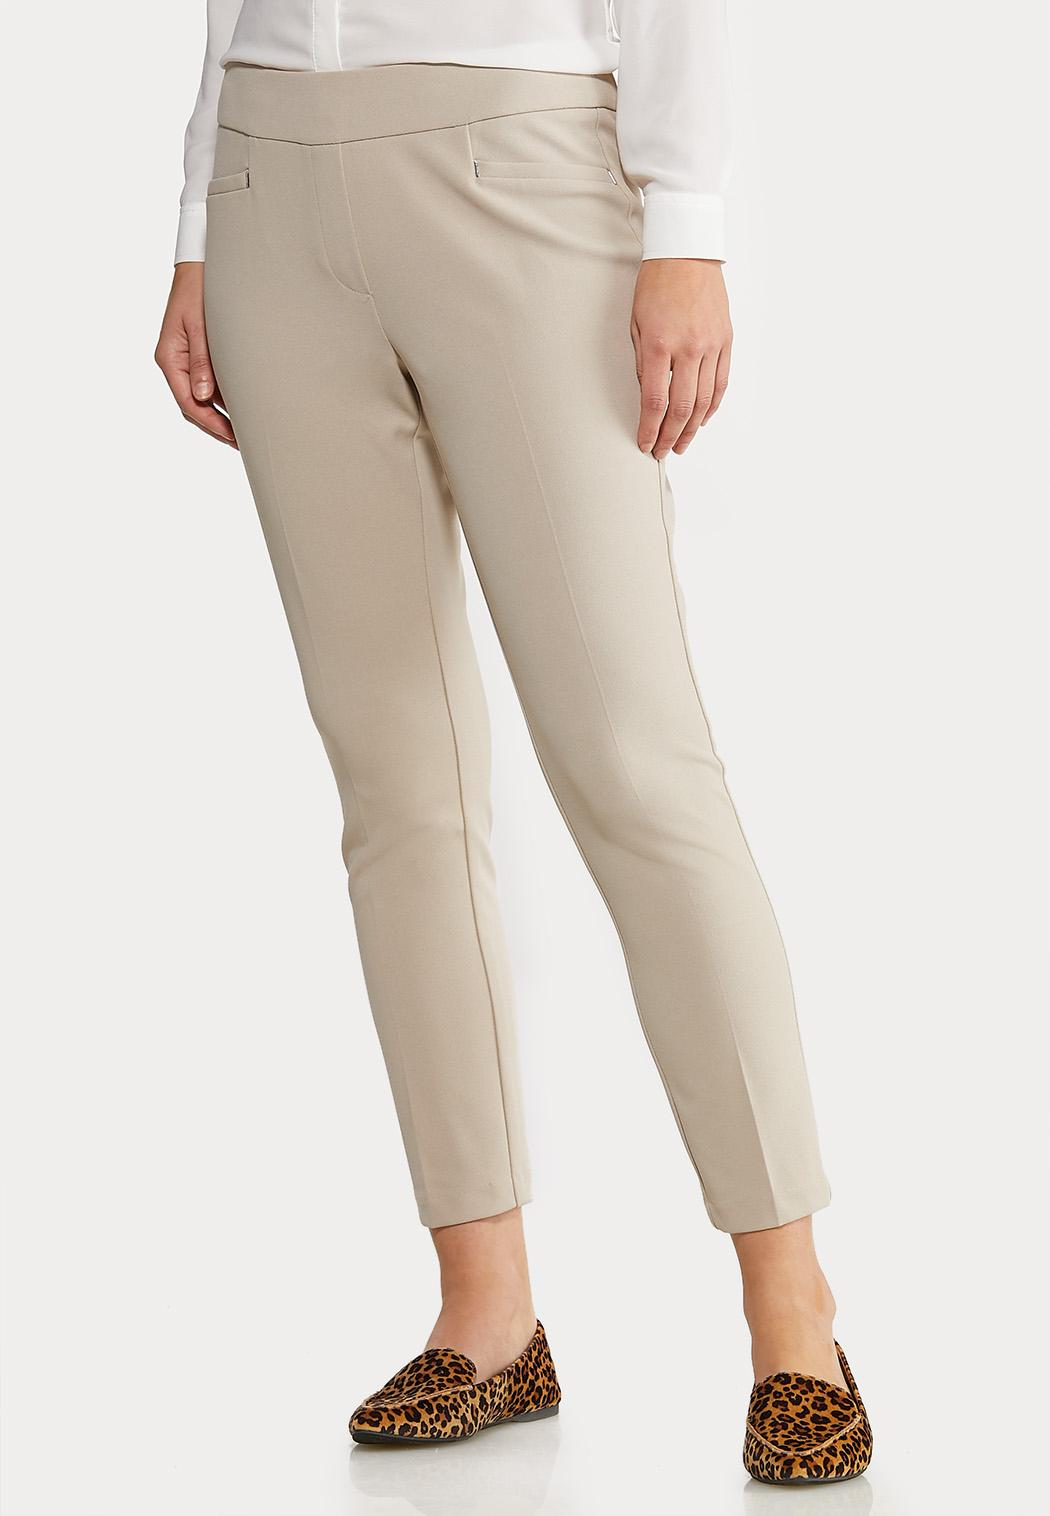 Petite Slim Ankle Pants